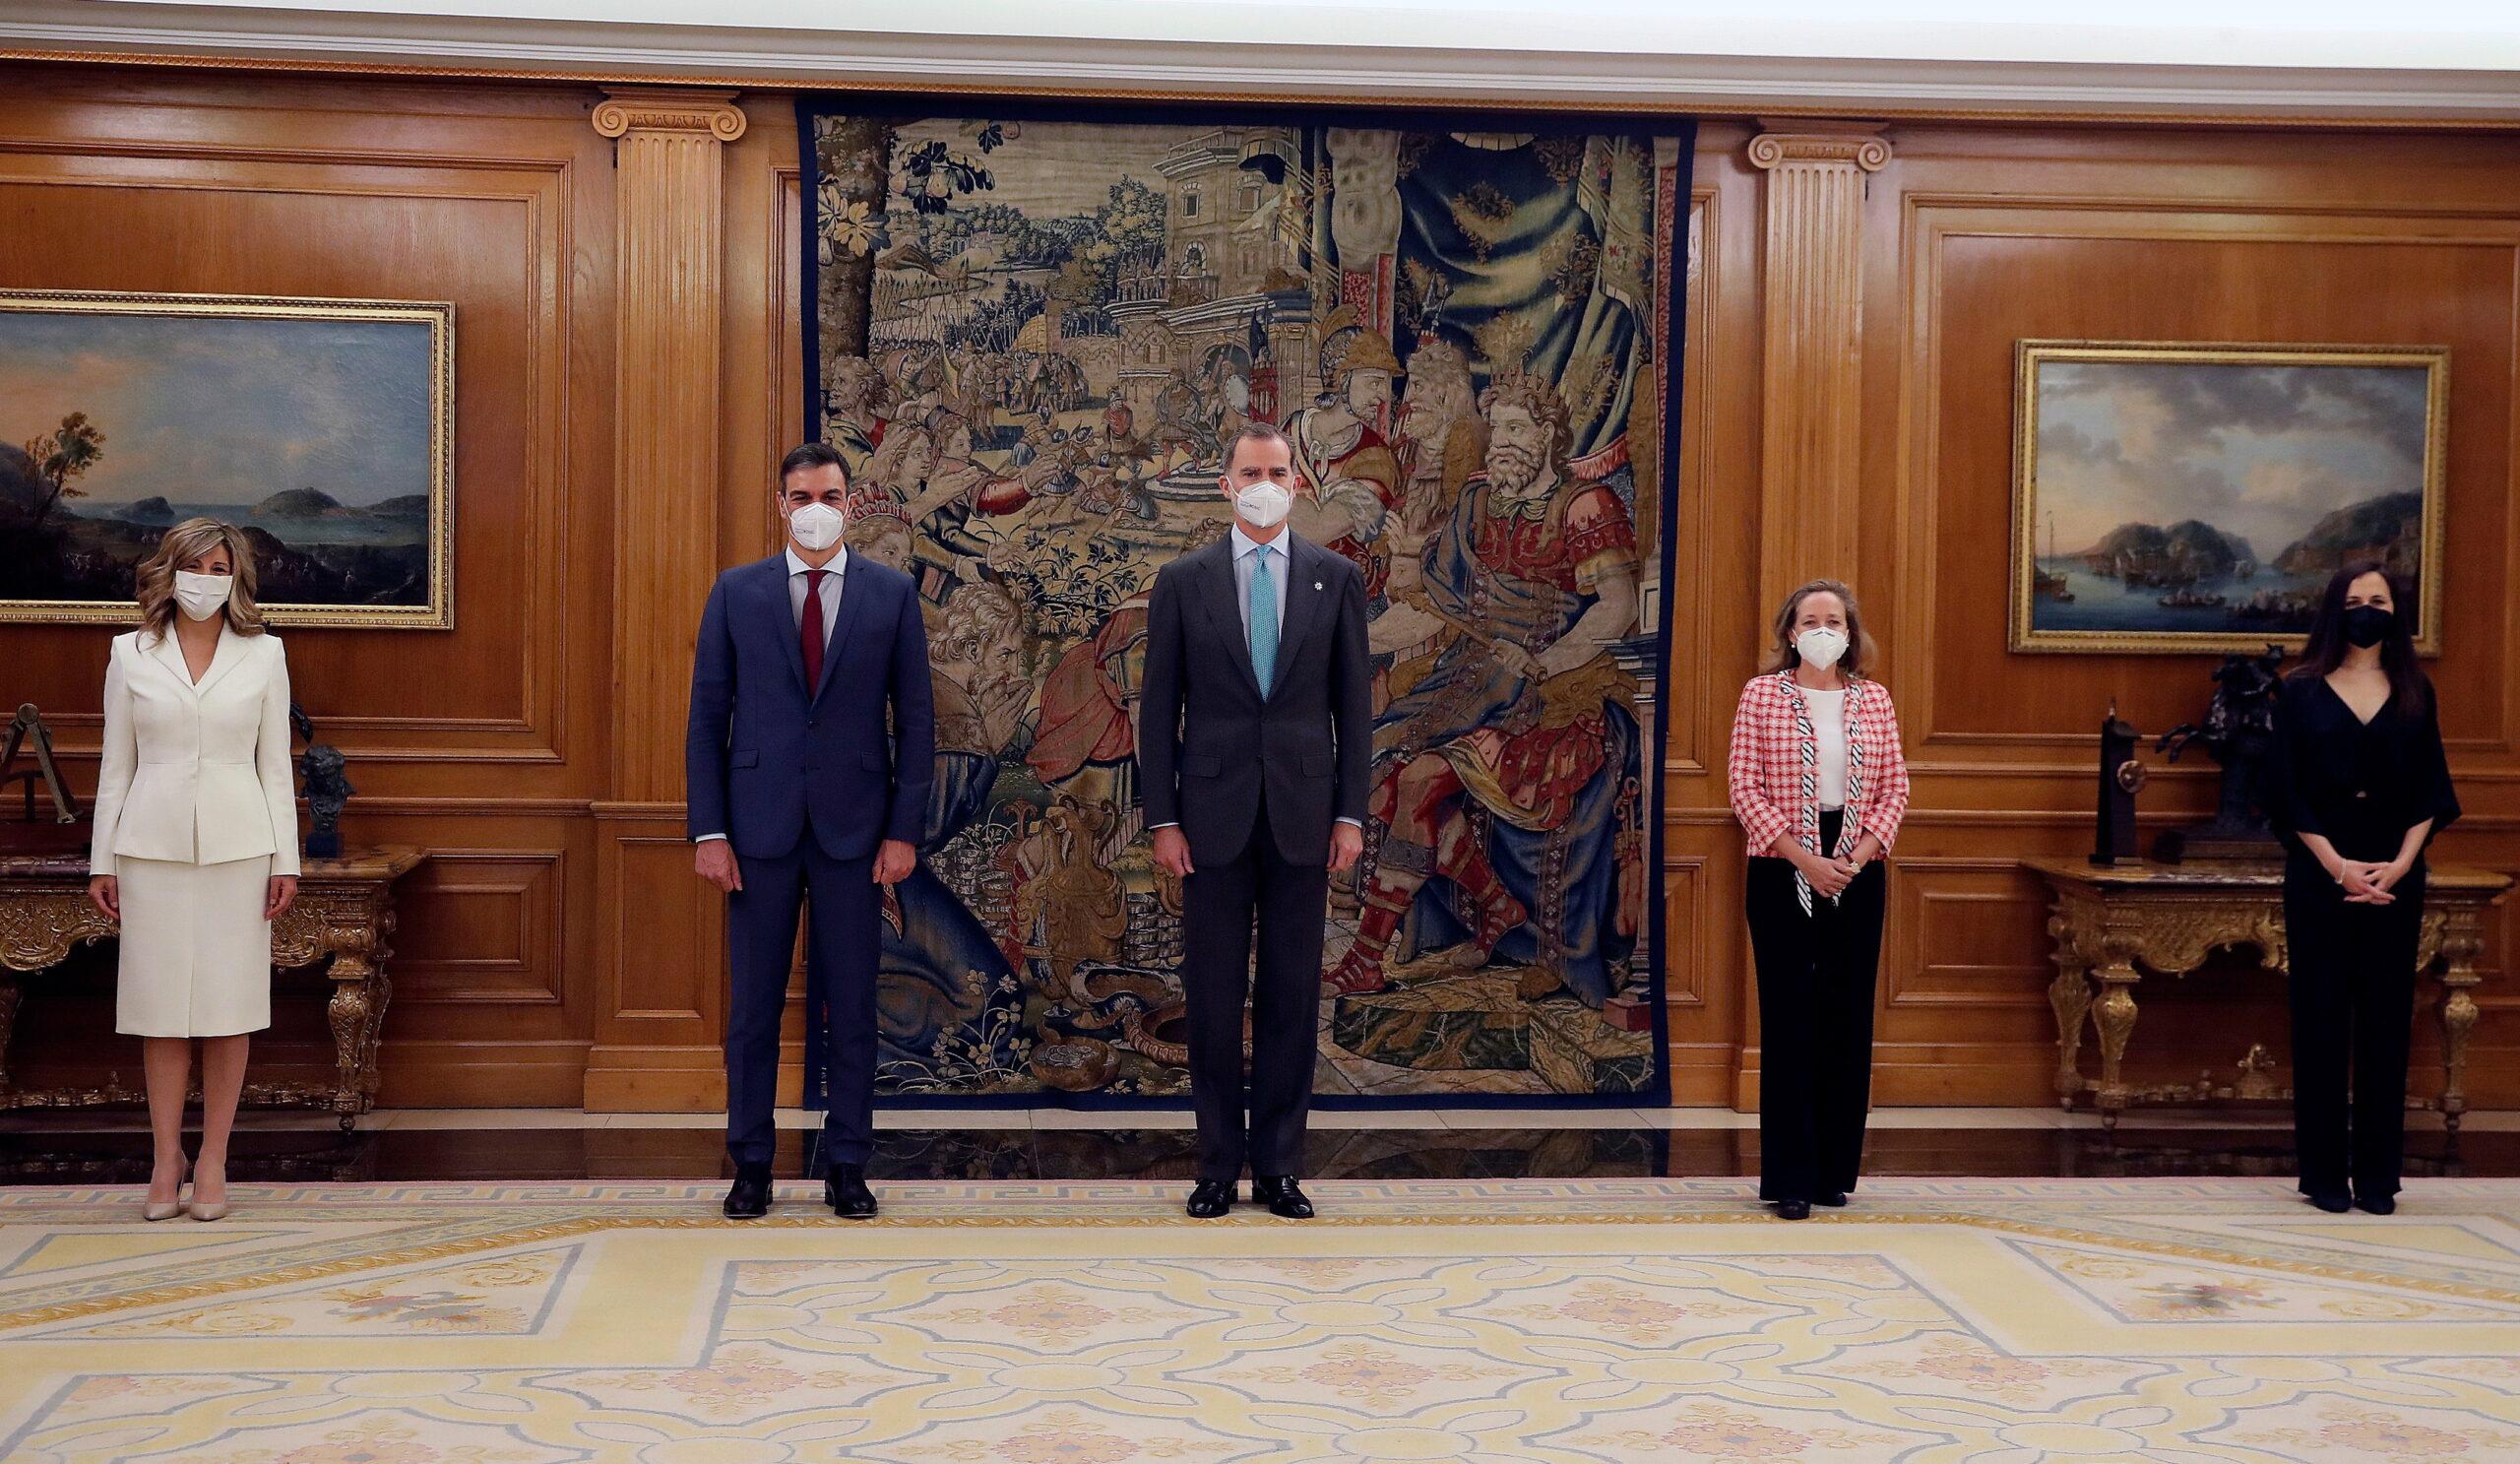 Yolanda Díaz, Pedro Sánchez, Felip VI, Nadia Calviño i Ione Belarra en l'acte de promesa de càrrecs al Palau de la Zarzuela | ACN